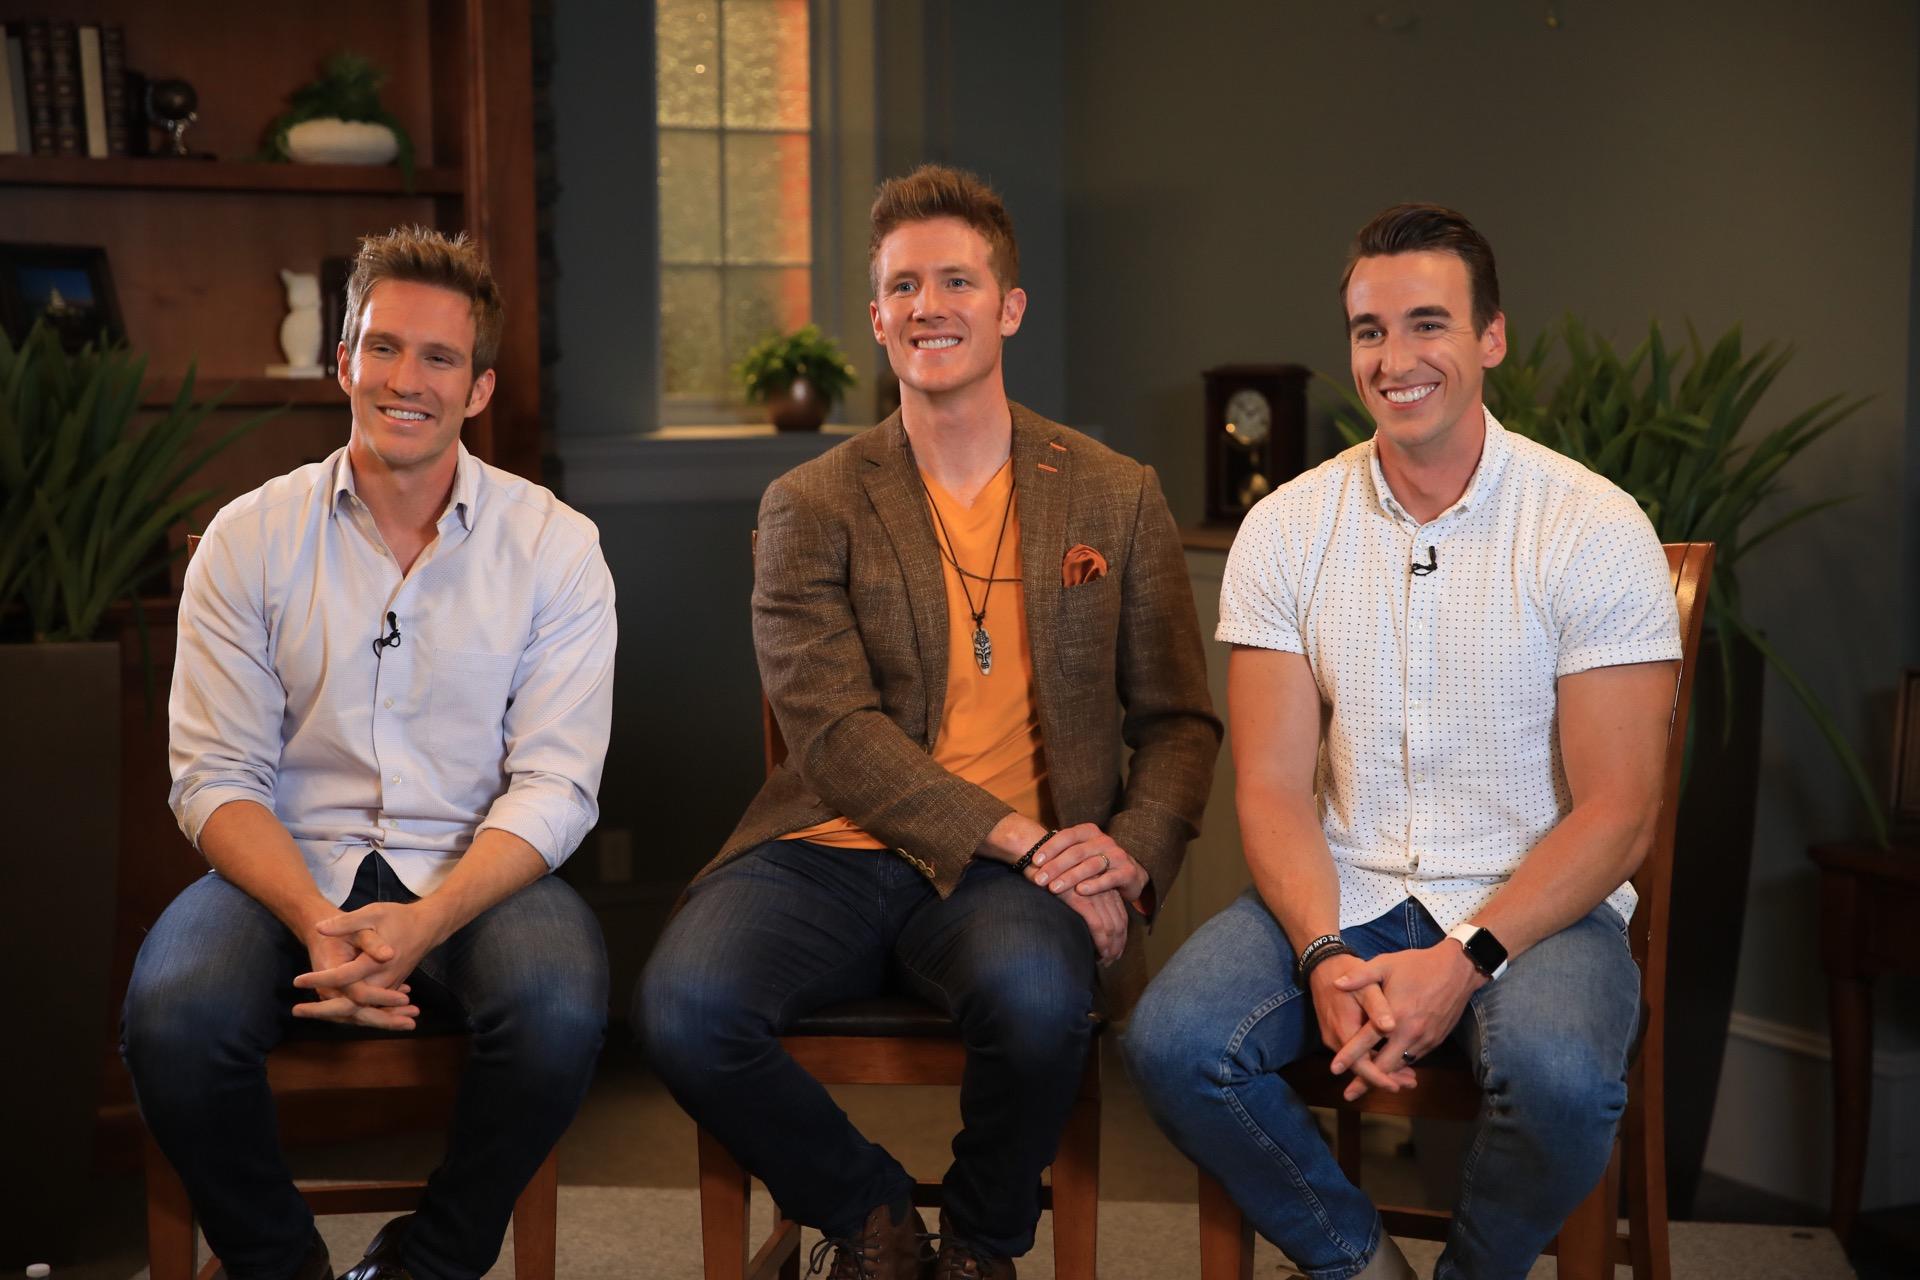 GENTRI, The Gentlemen Trio comprises three tenors: Bradley Quinn Lever, Casey Elliott and Brad Robins.